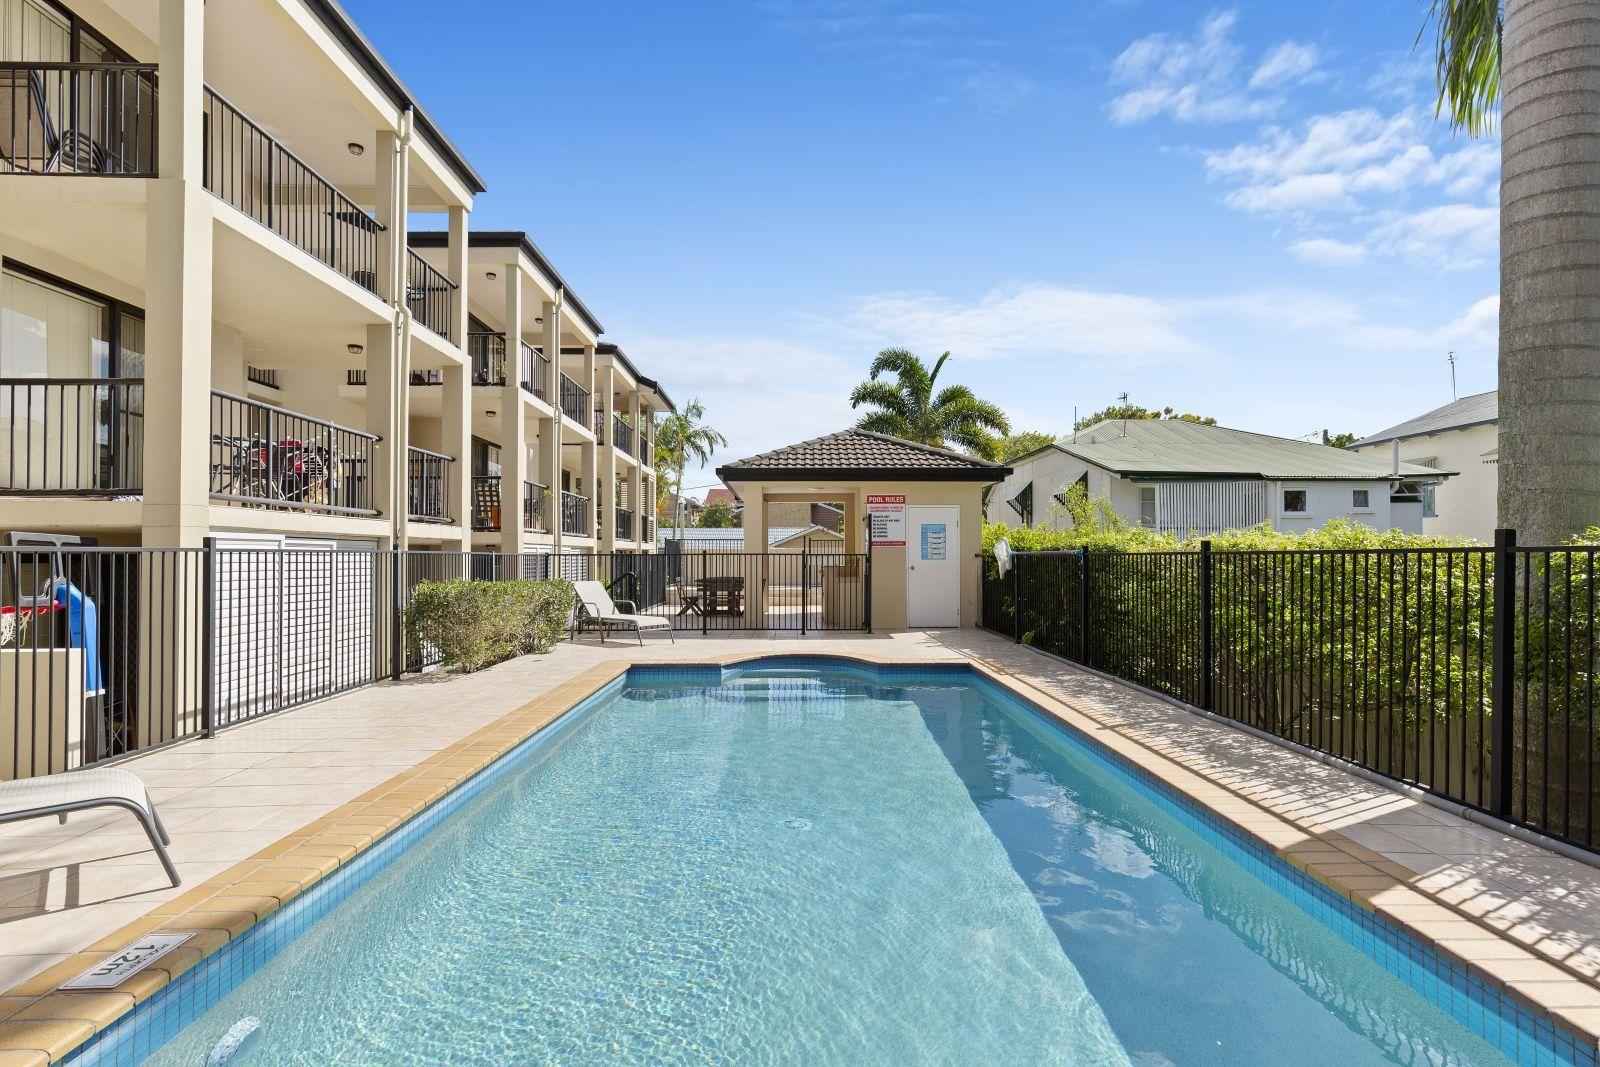 14/3 Tate  Street, Southport QLD 4215, Image 1